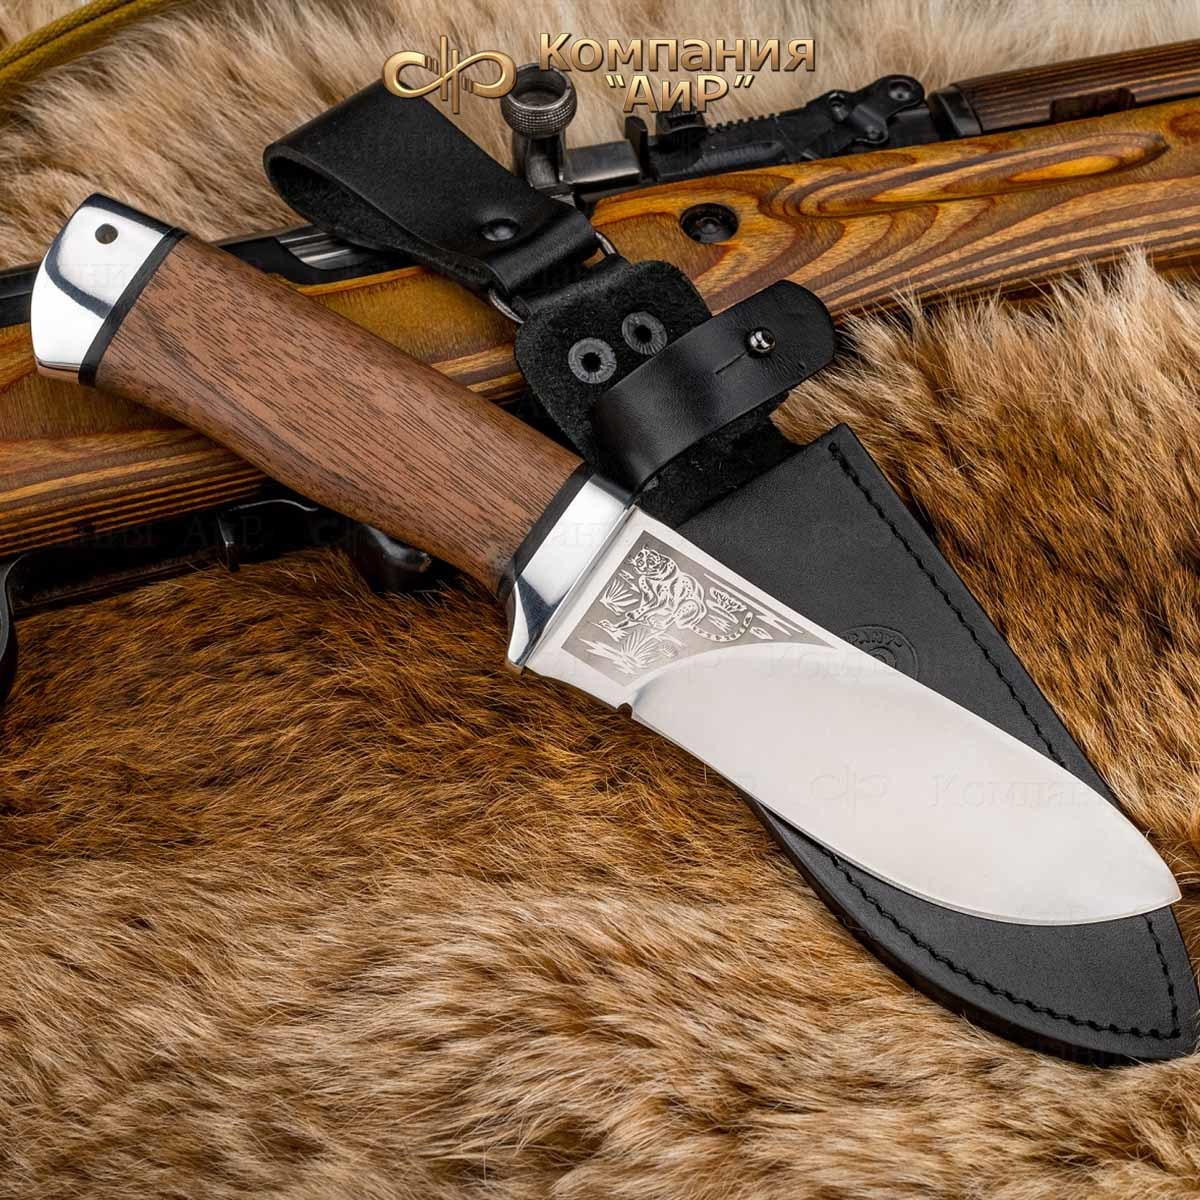 Нож разделочный Аир Гепард, сталь 100х13м, рукоять дерево